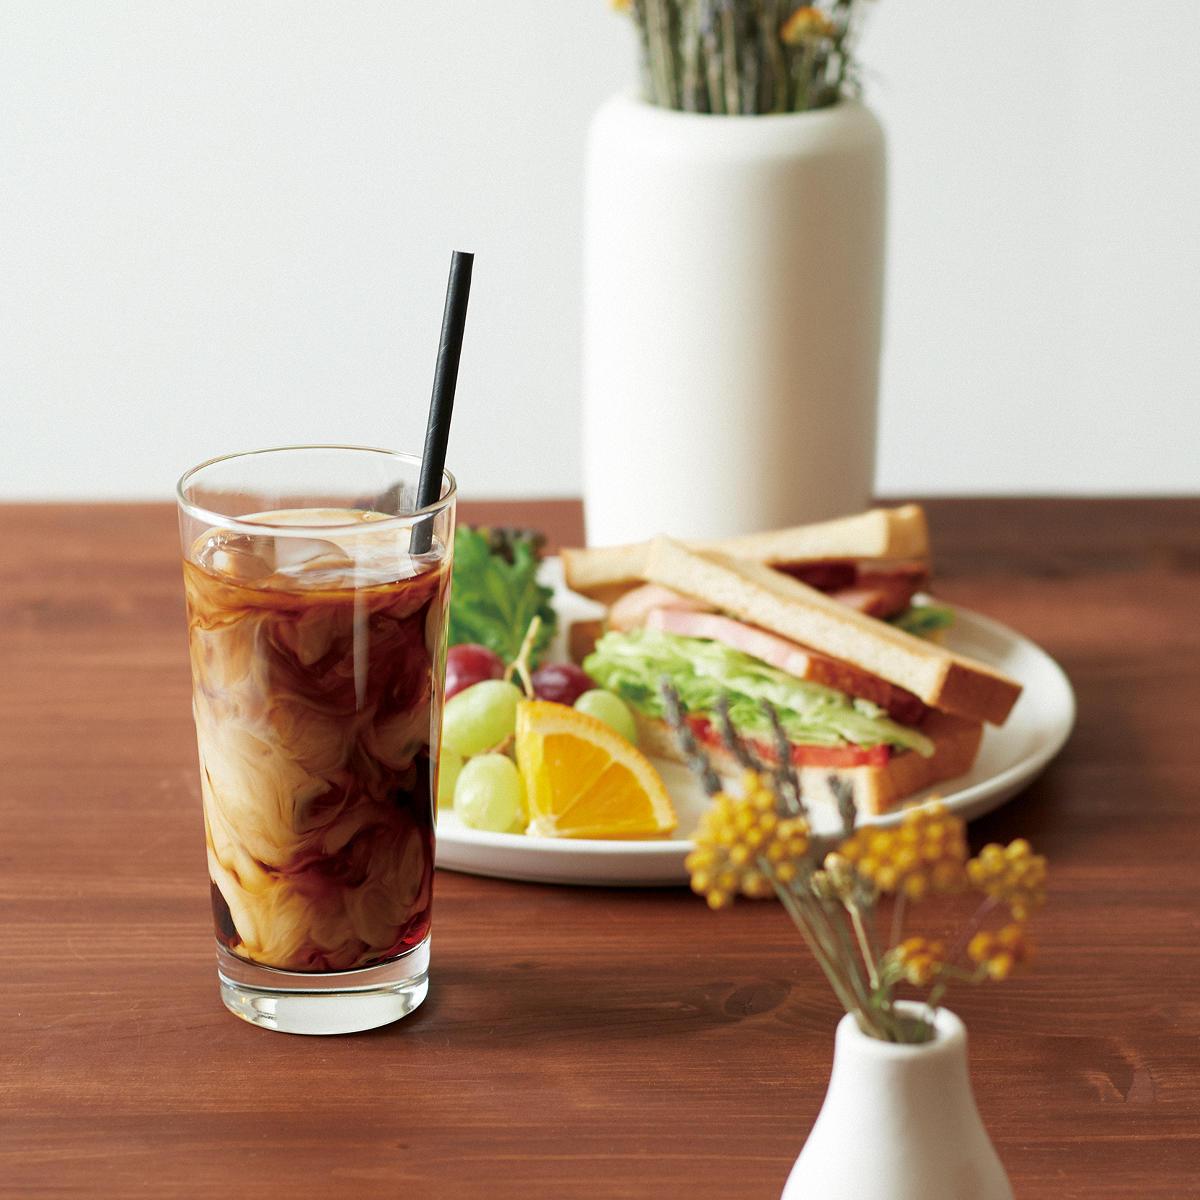 icedcoffee2020_2_11.jpg